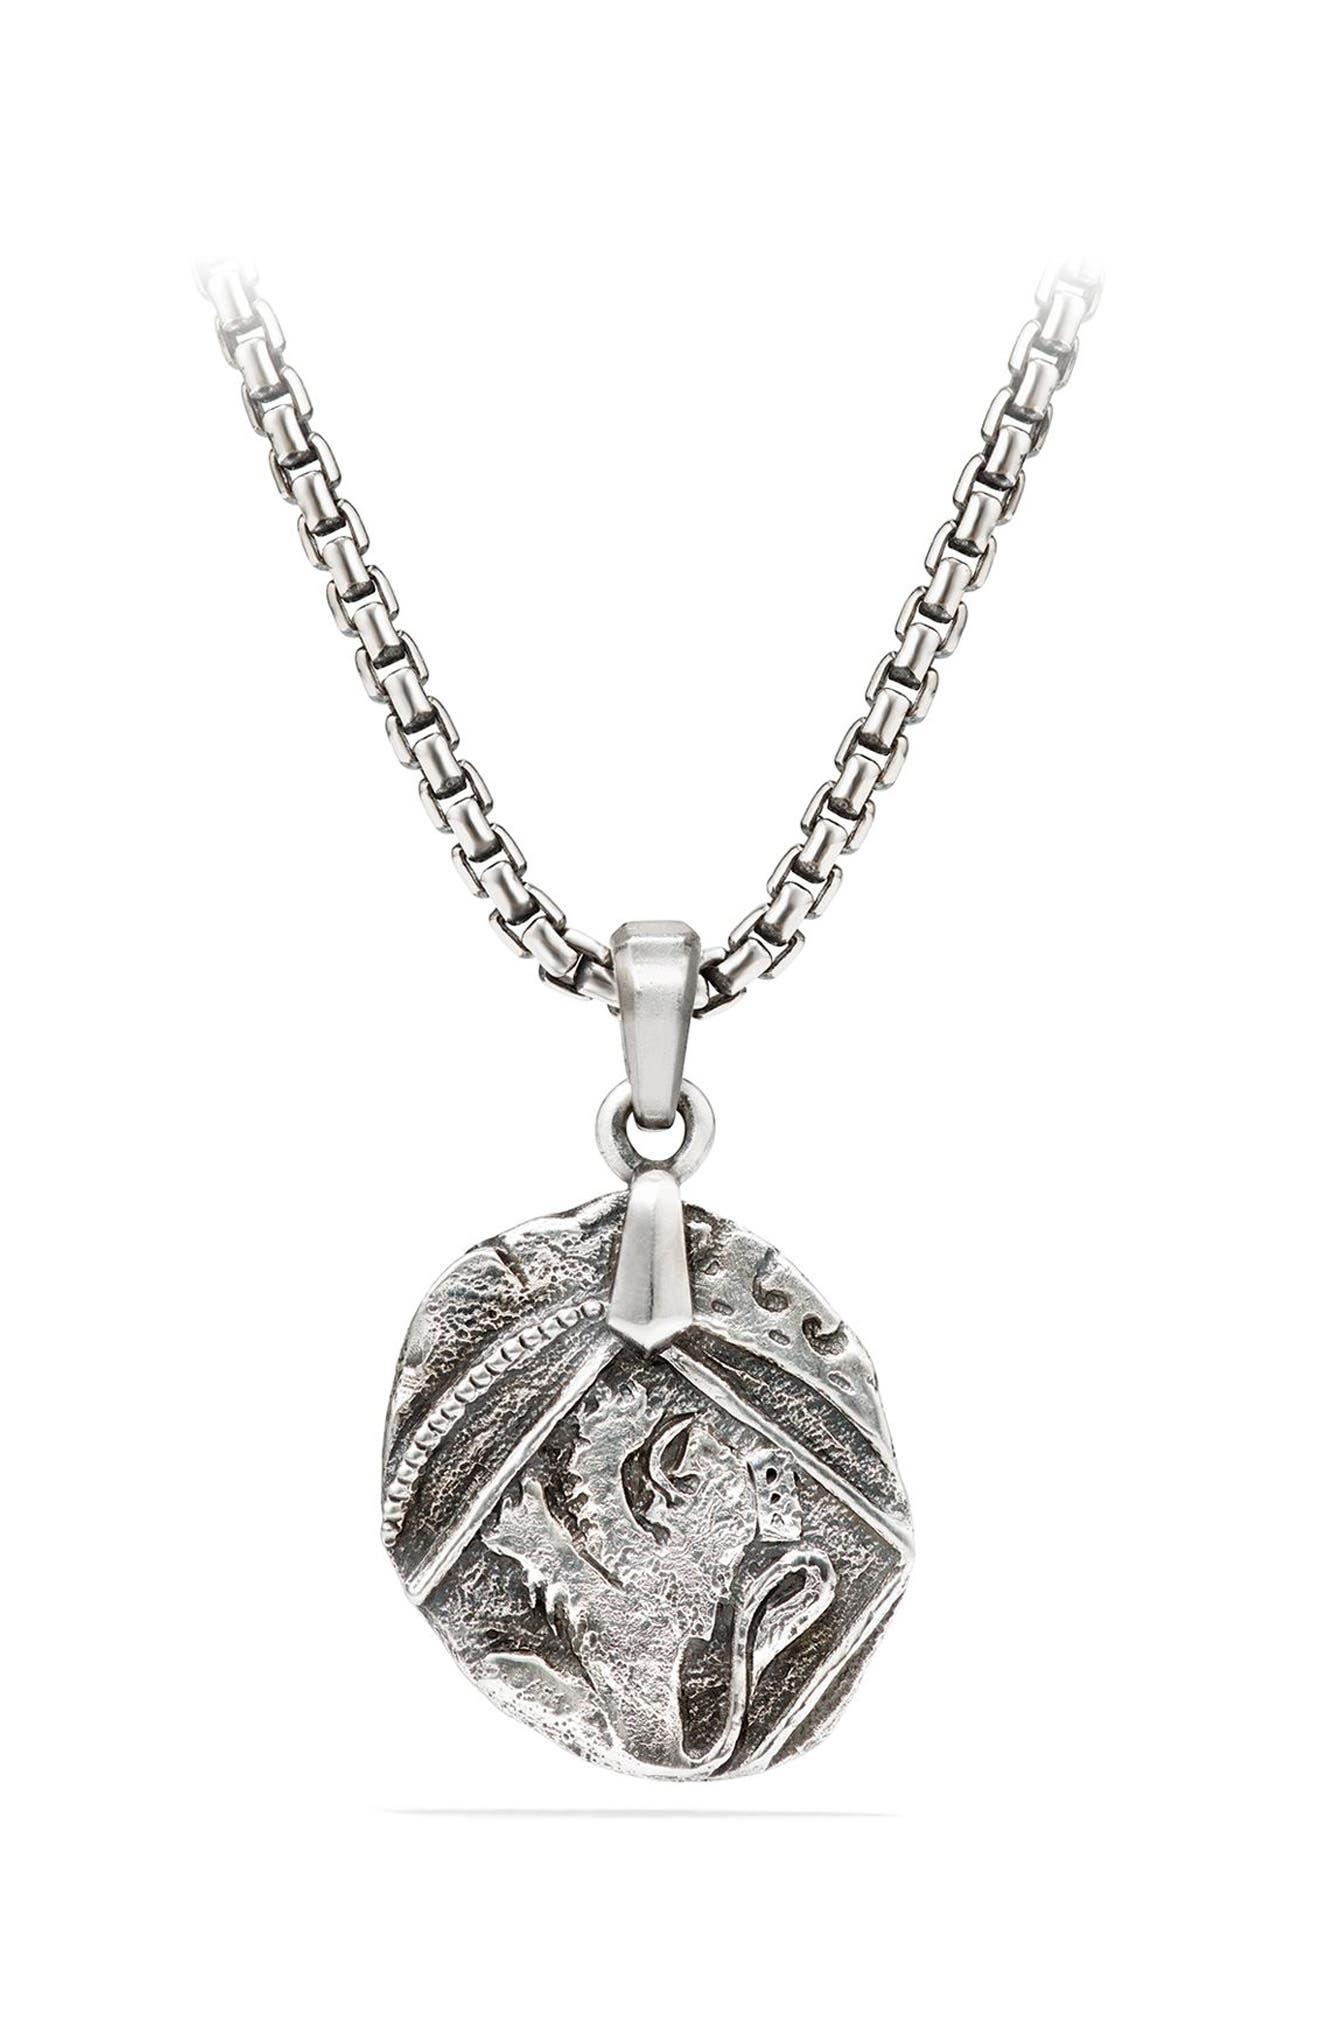 david yurman shipwreck coin amulet 23mm